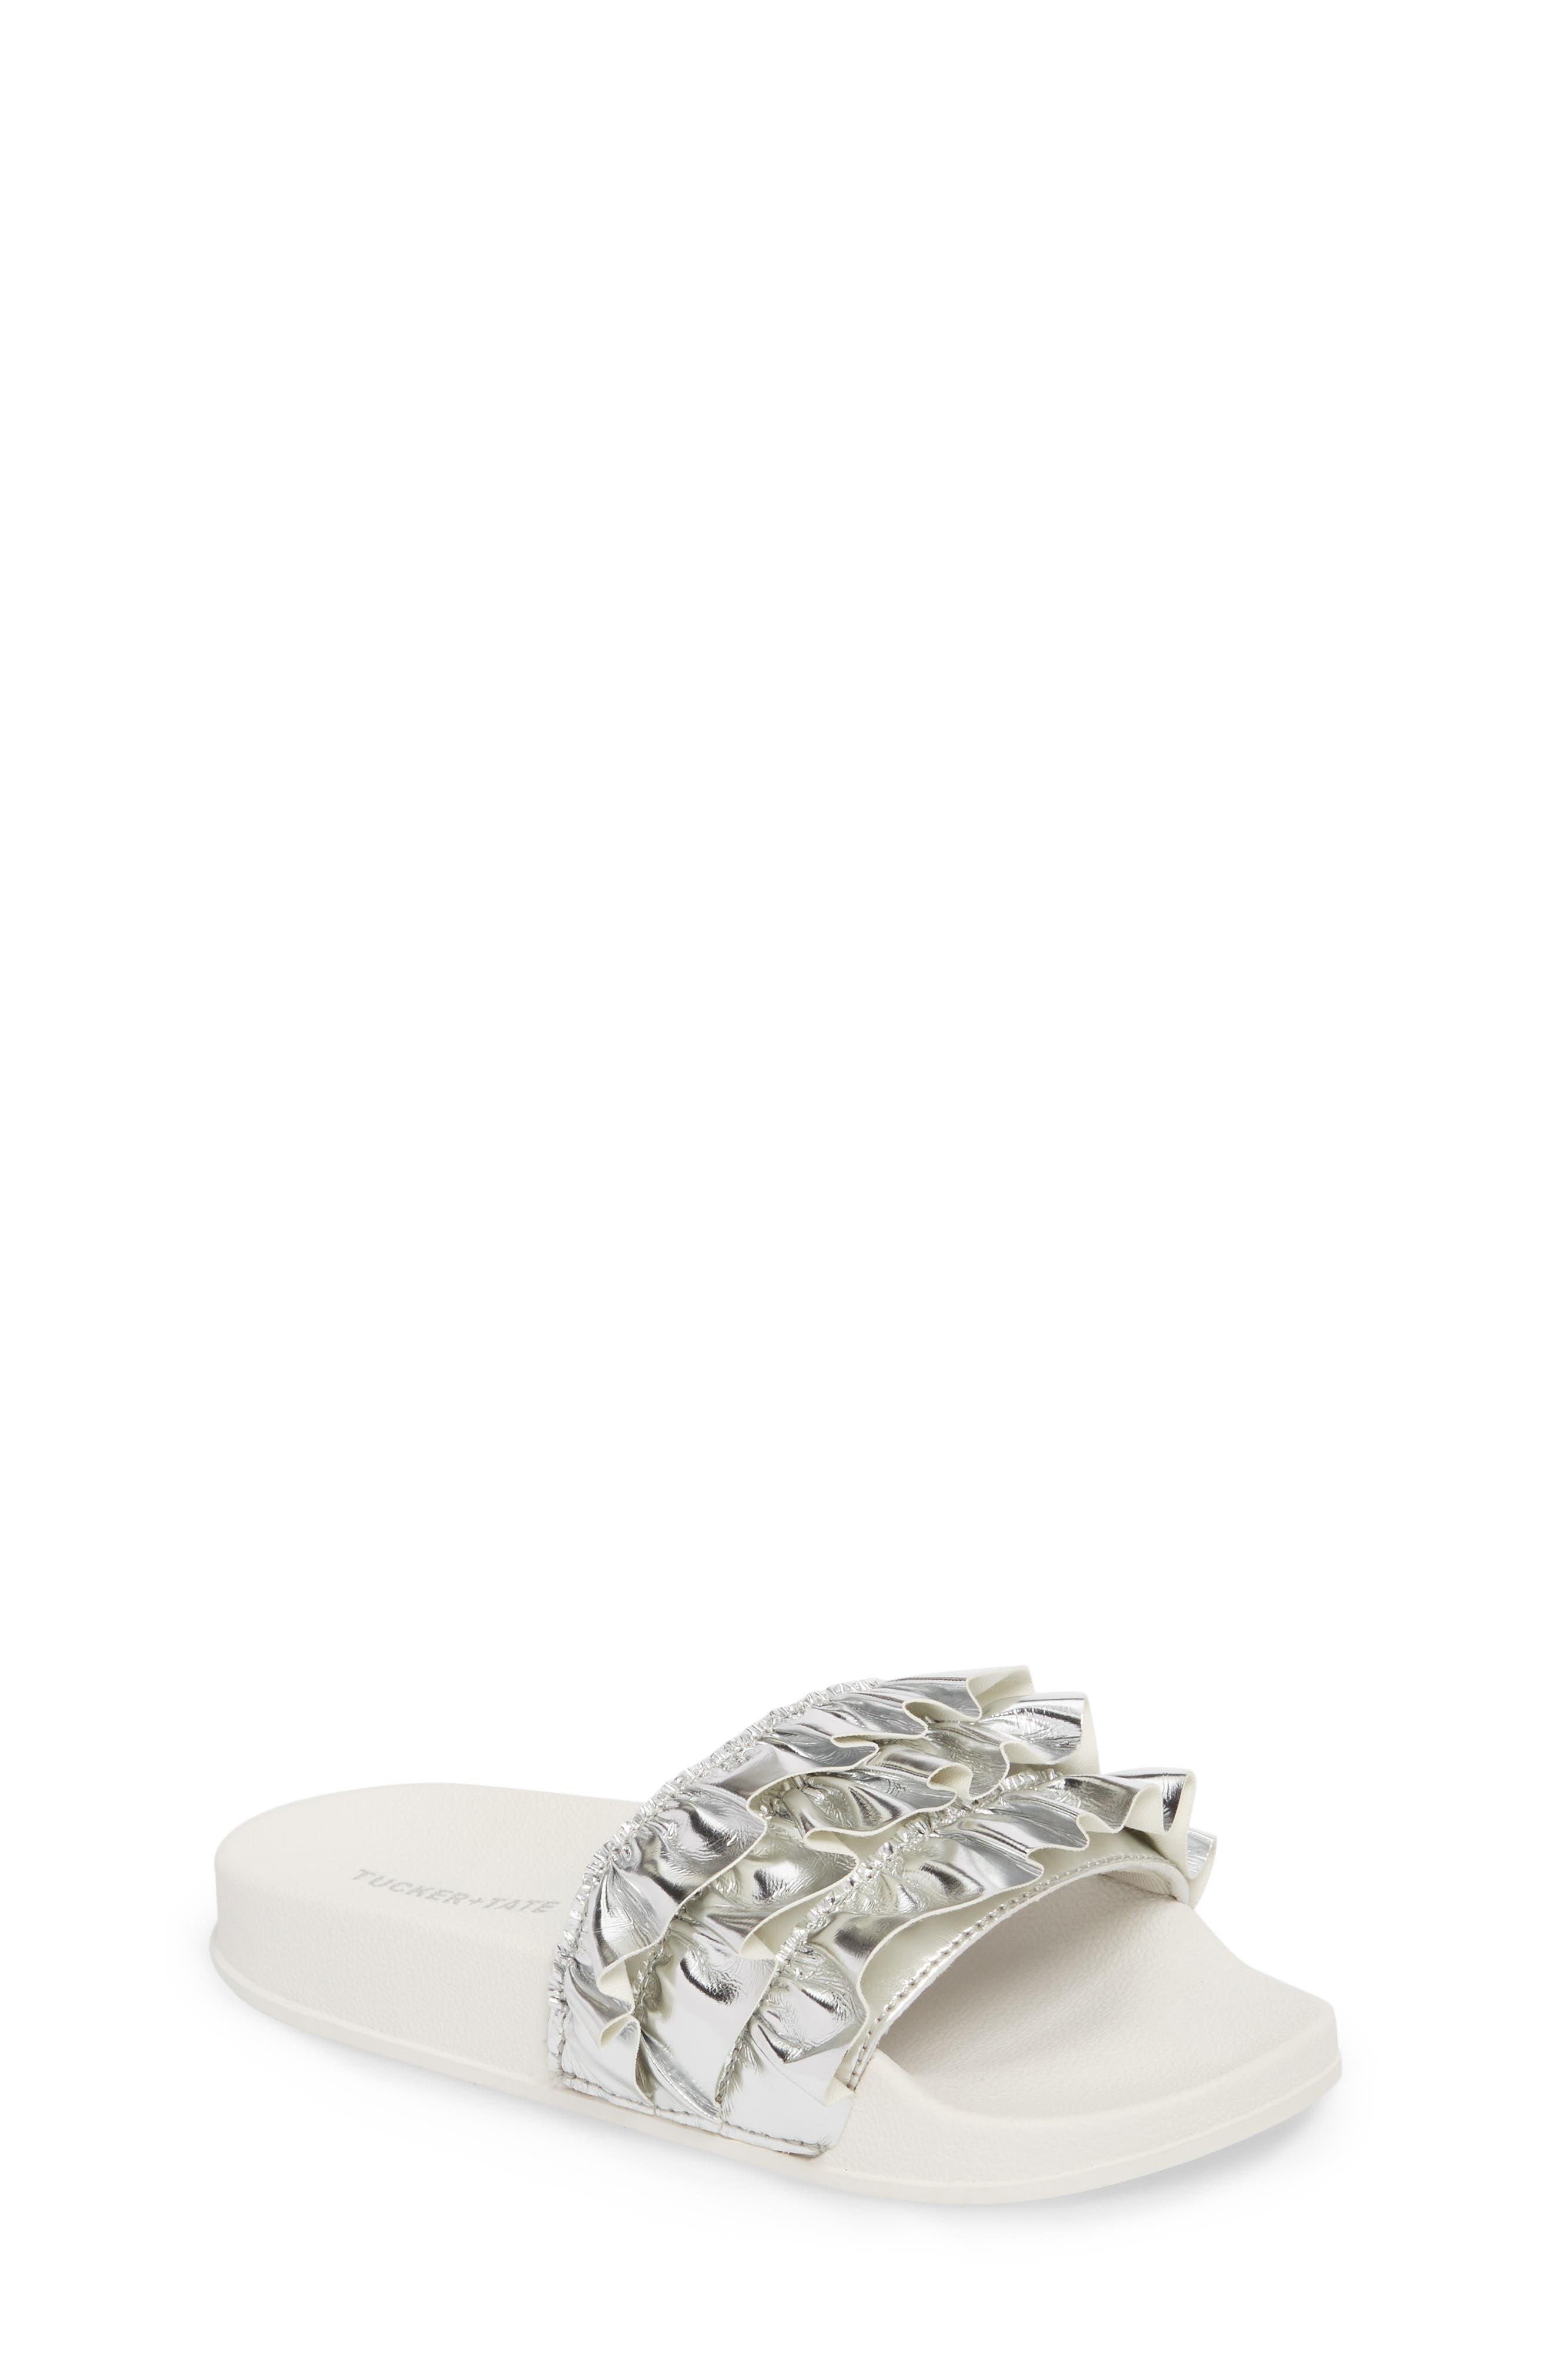 Metallic Ruffle Slide Sandal,                             Main thumbnail 1, color,                             Silver Faux Leather